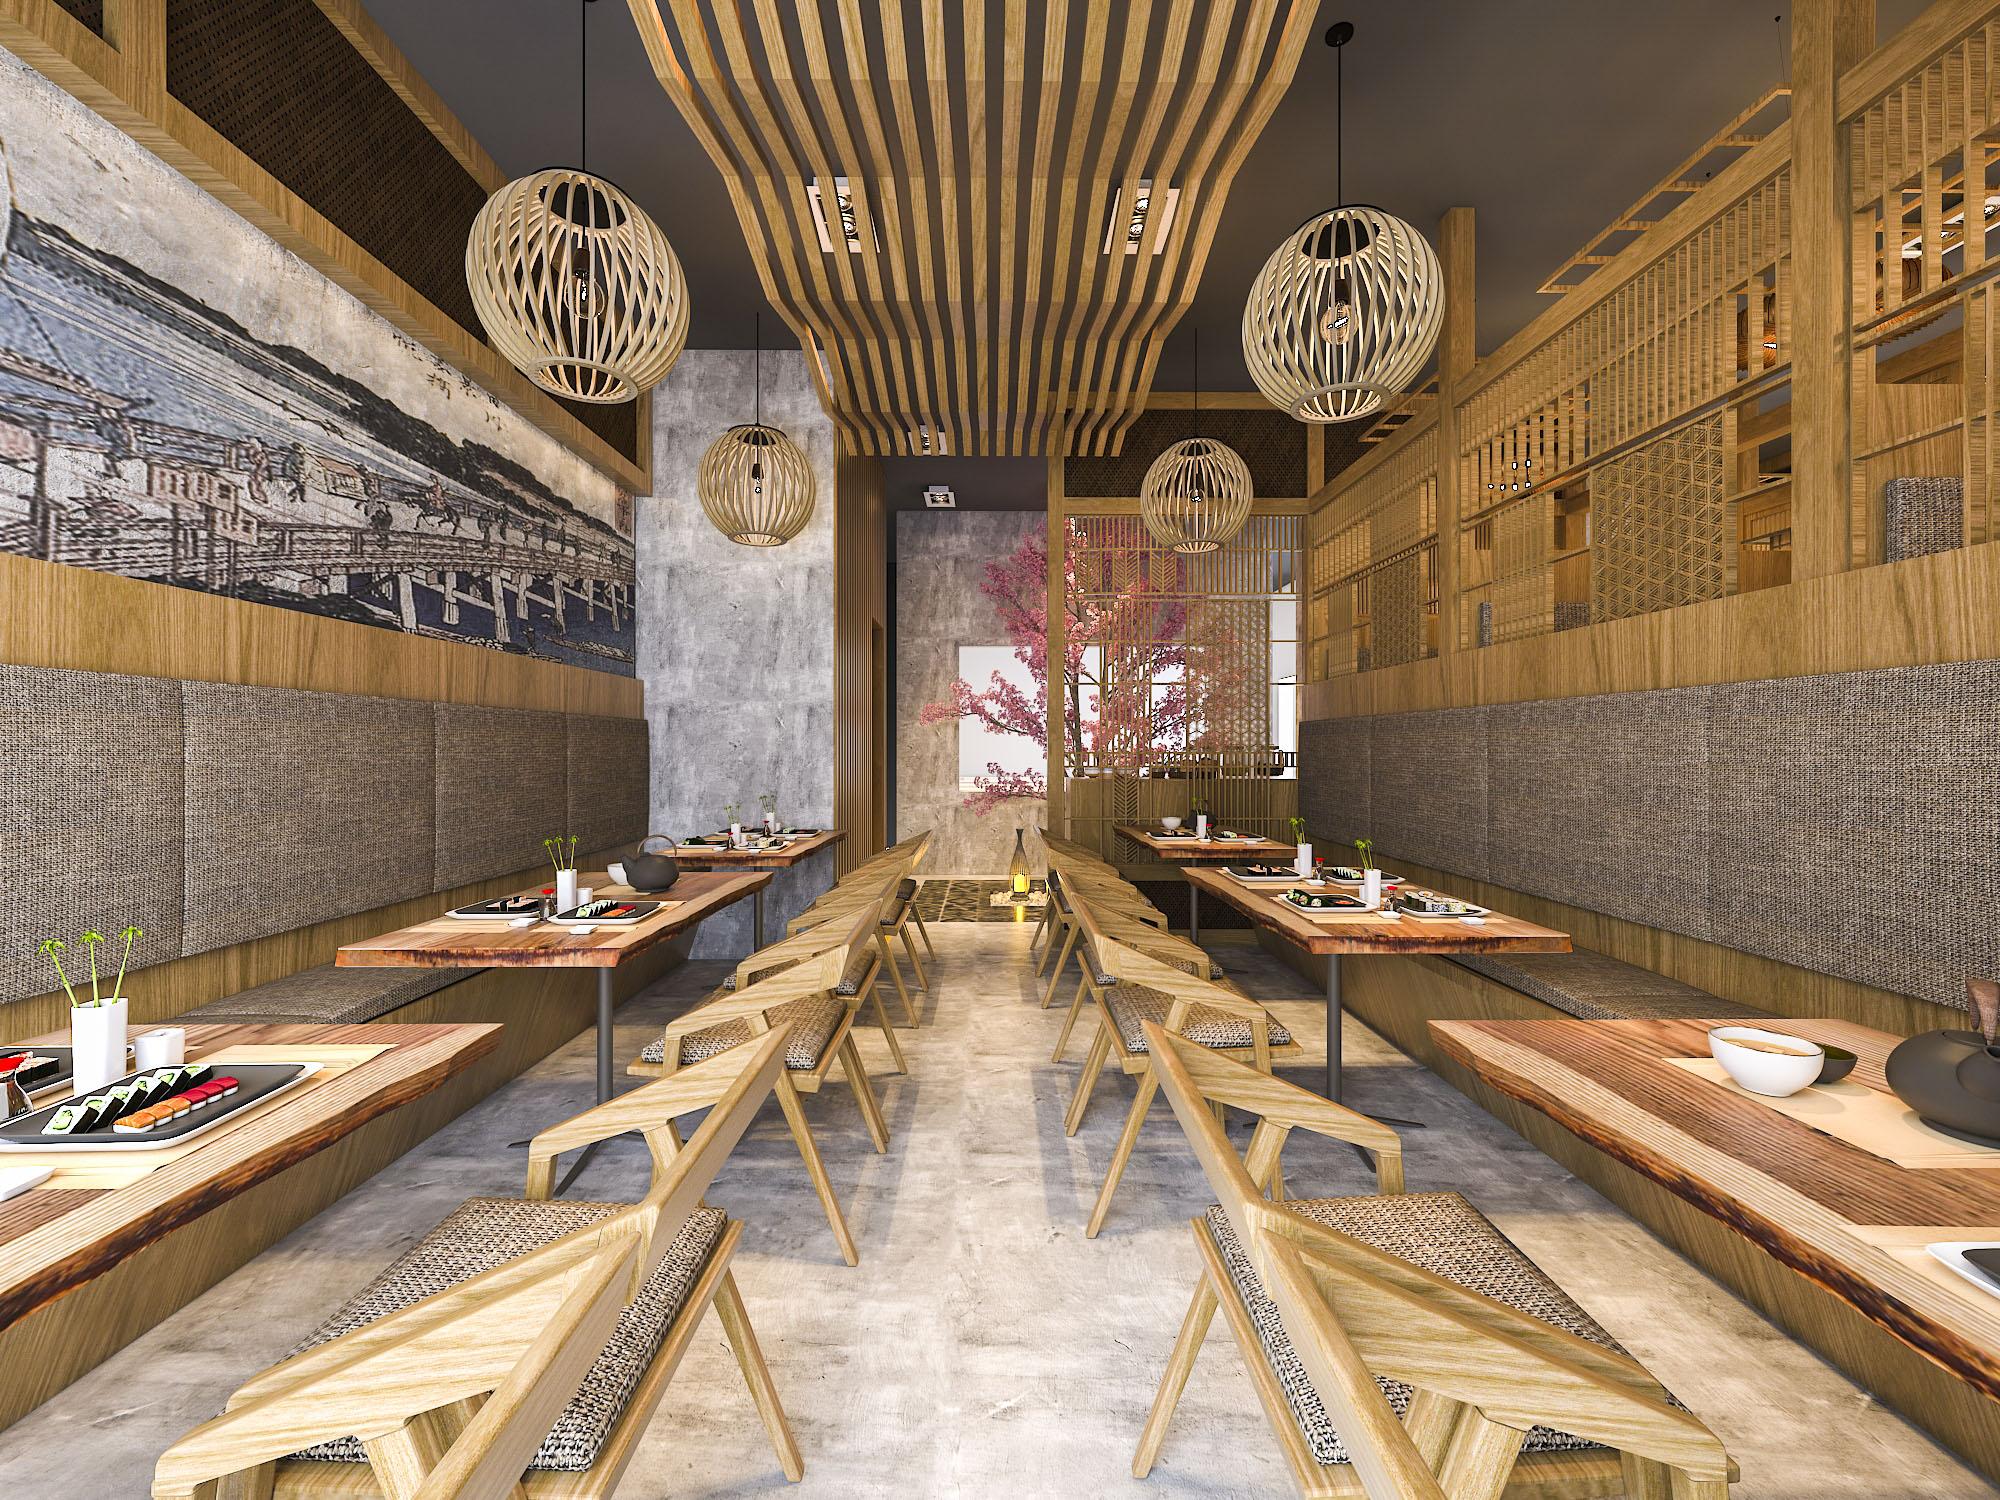 thiet-ke-noi-that-nha-hang-shinko-restaurant81